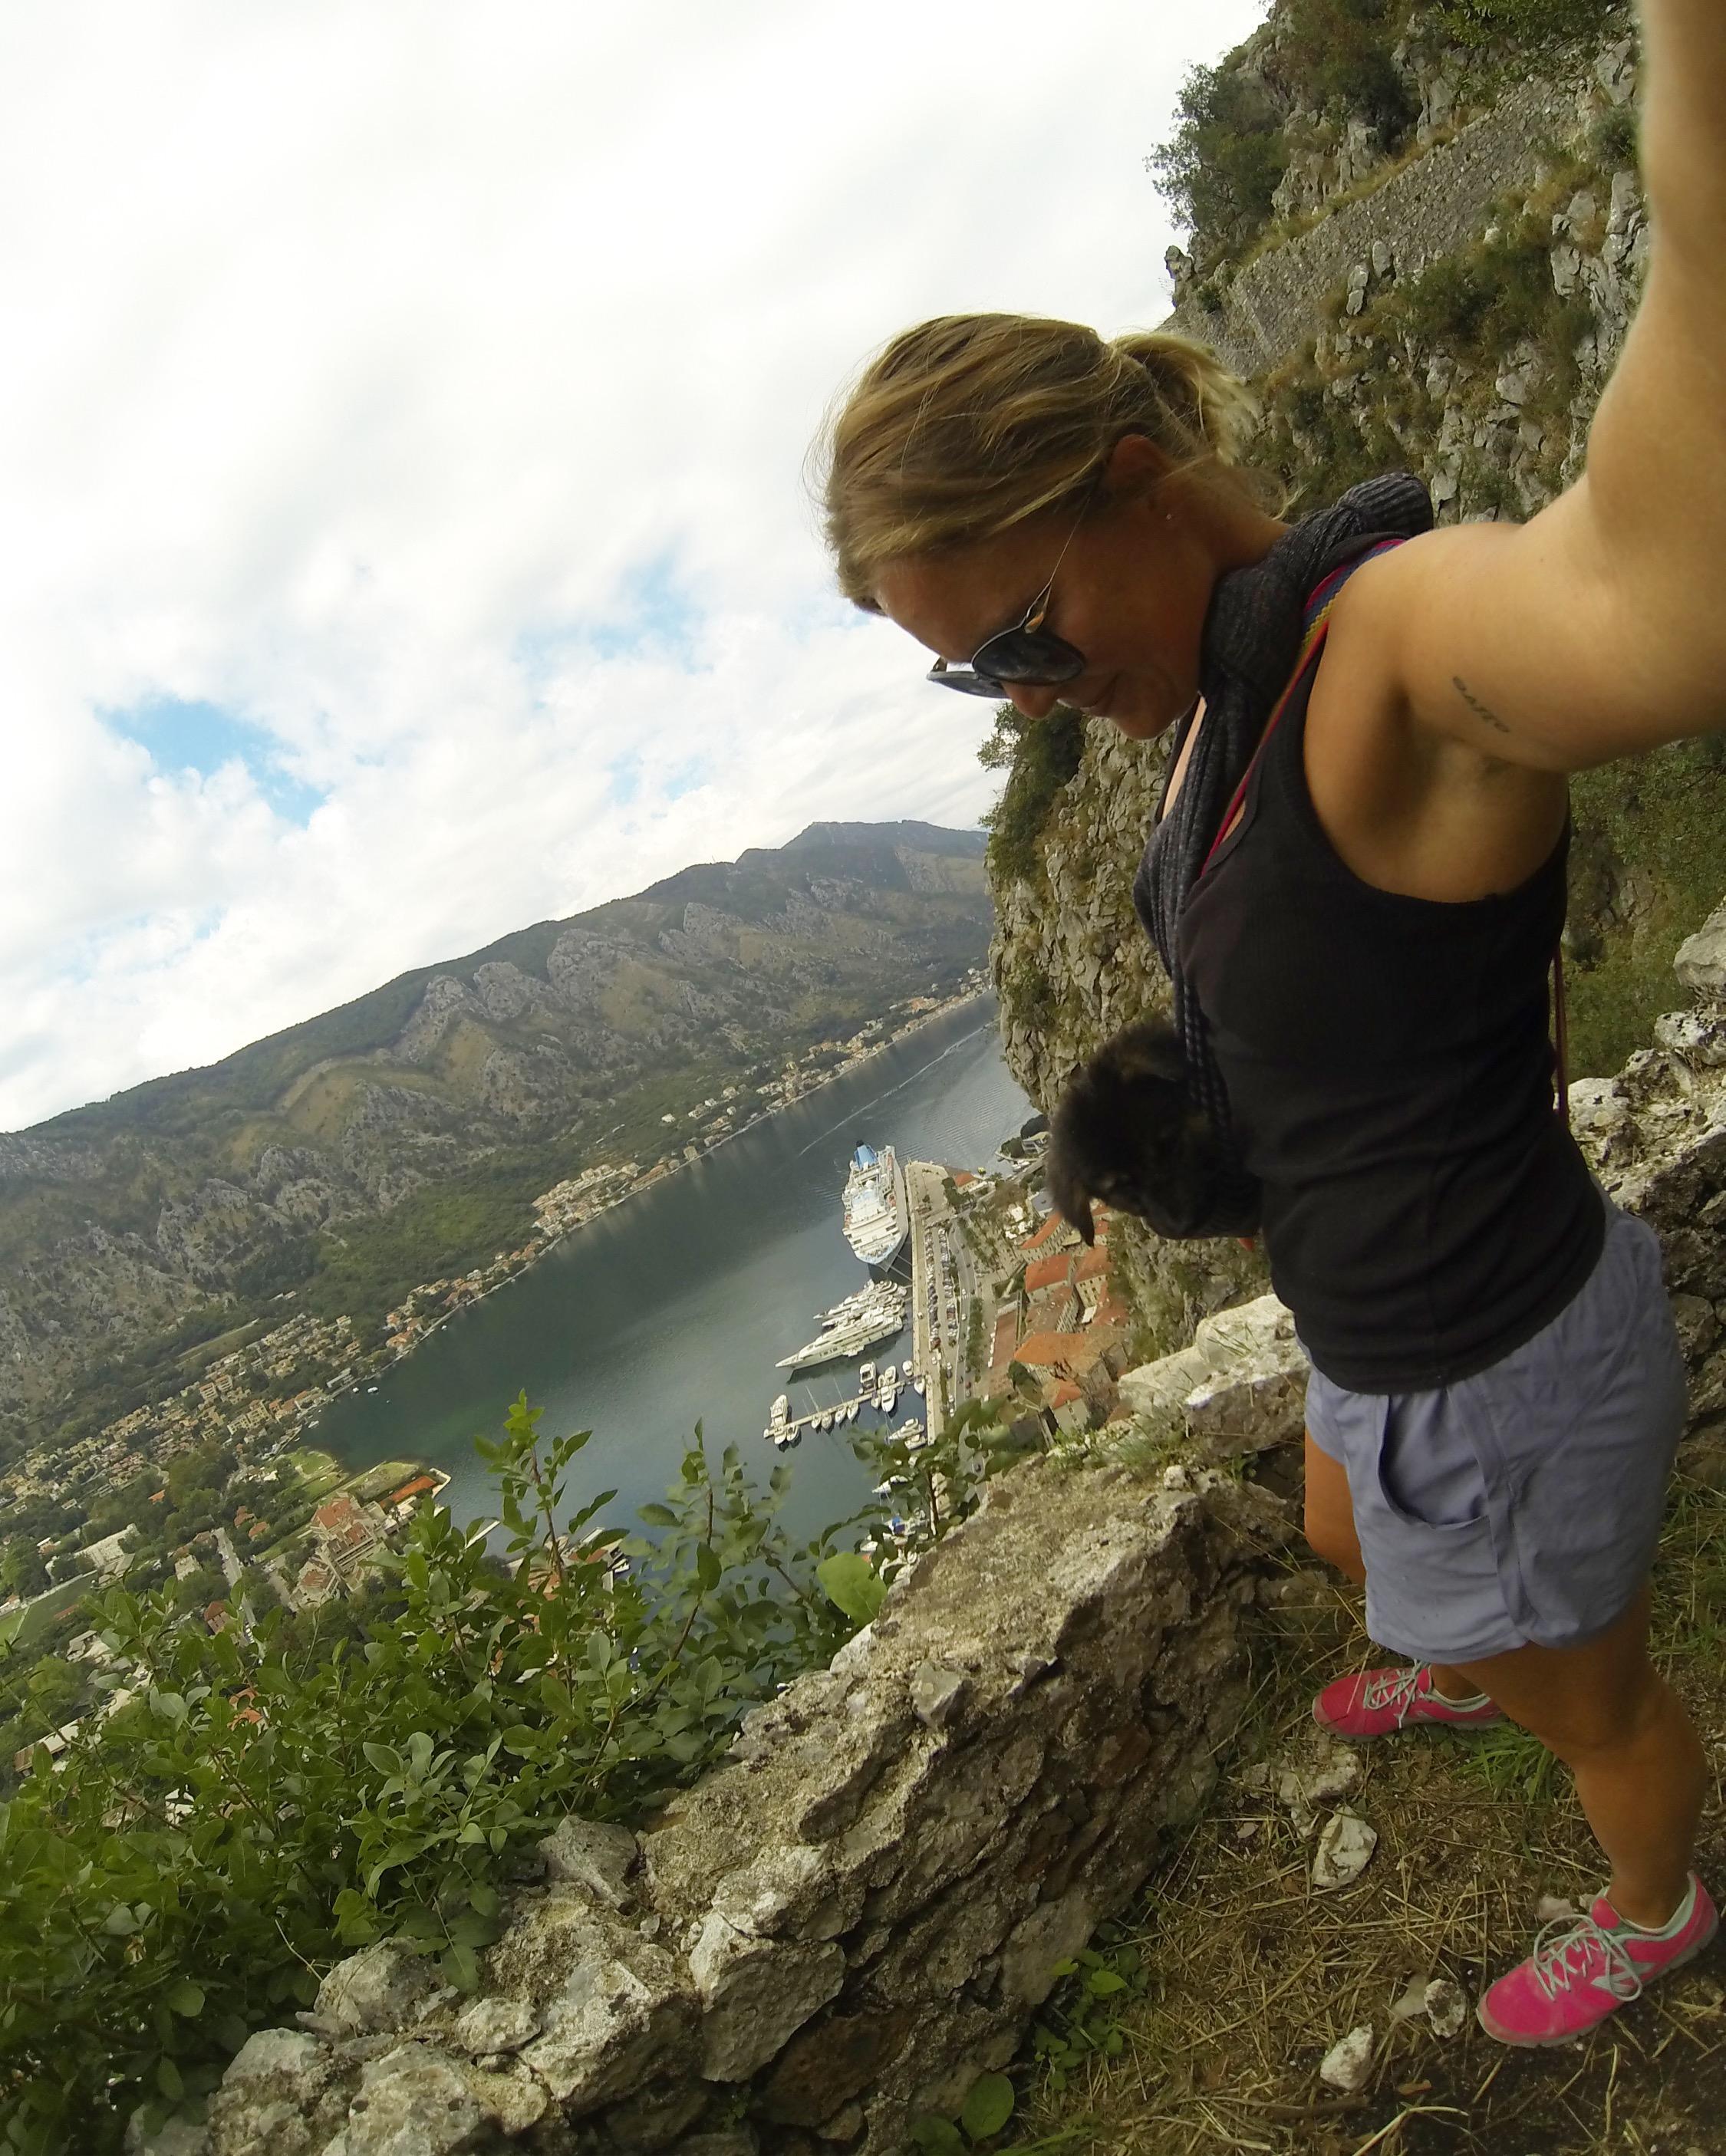 Nik + me hiking in Kotor